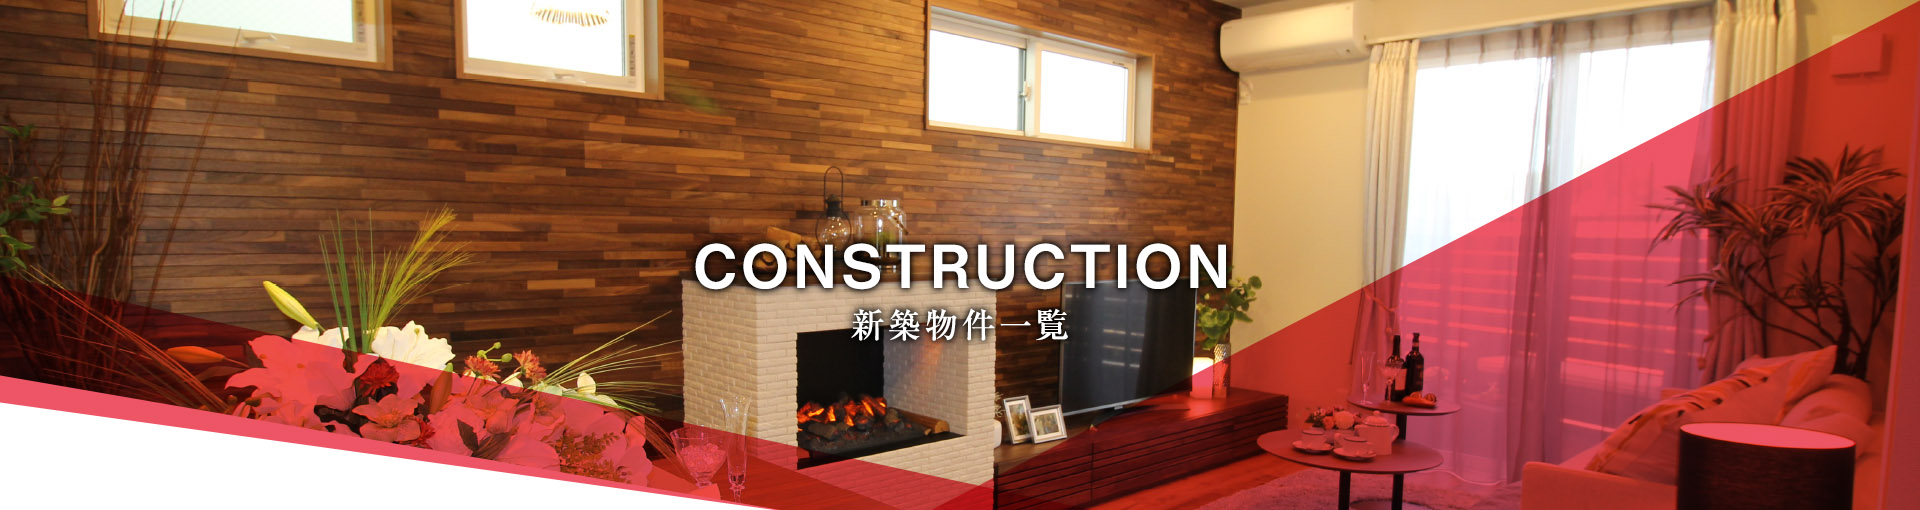 CONSTRUCTION 新築物件一覧